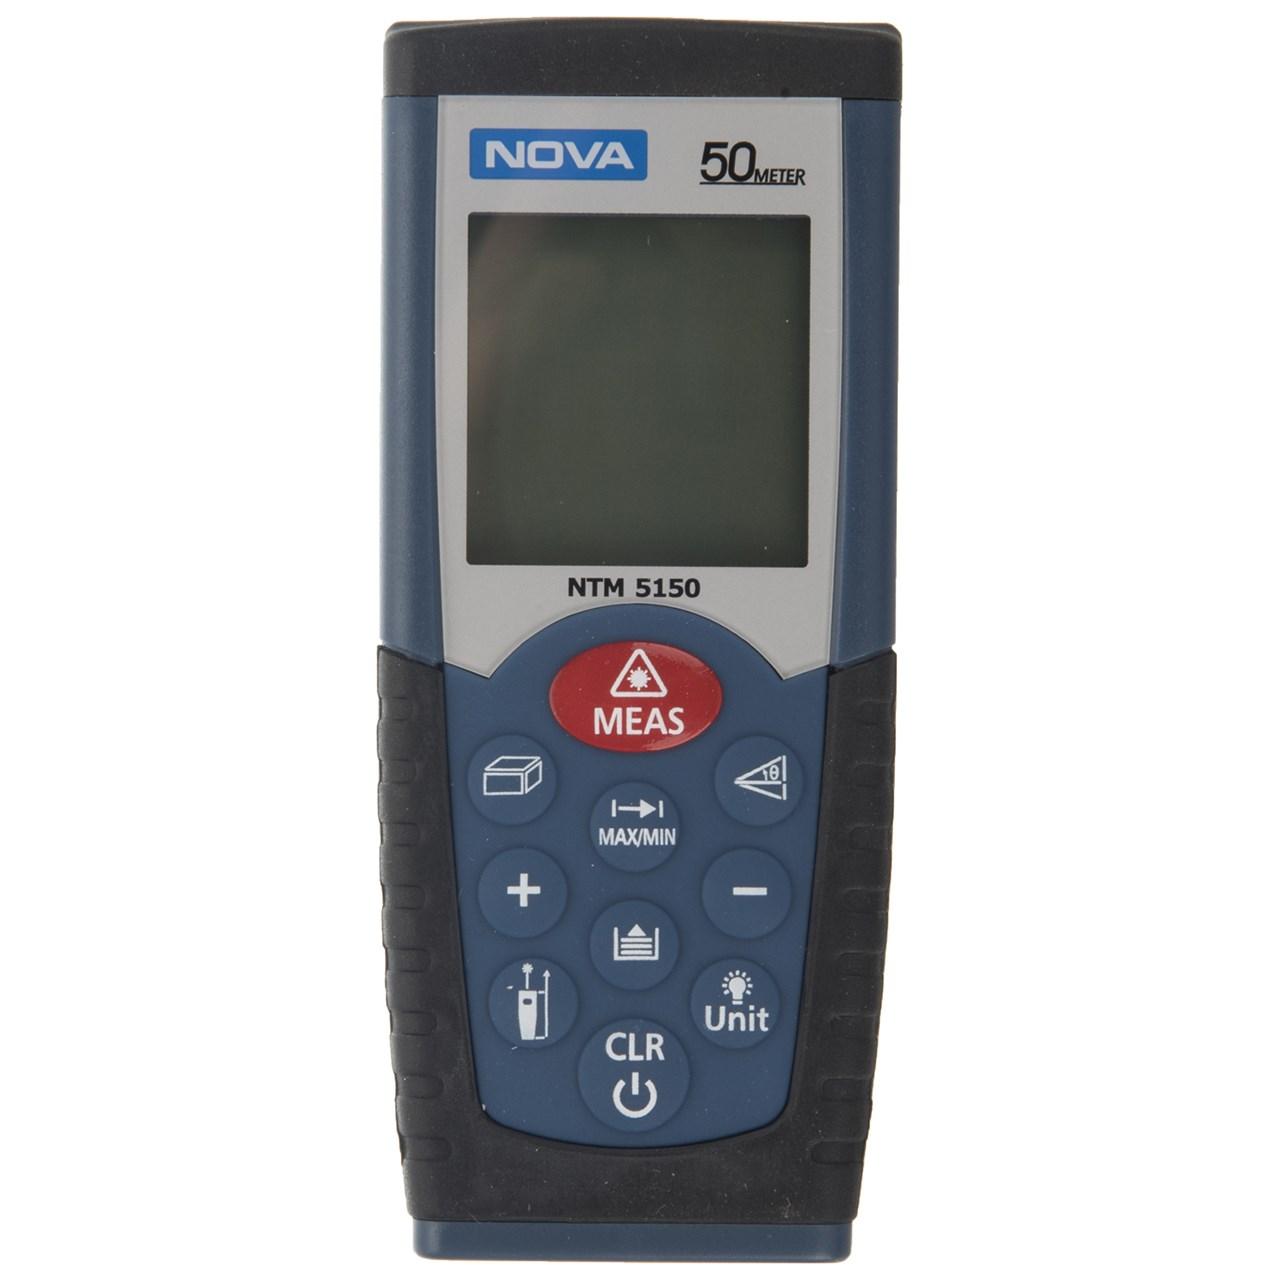 متر لیزری نووا مدل NTM-5150 | Nova NTM-5150  Laser Distance Meter